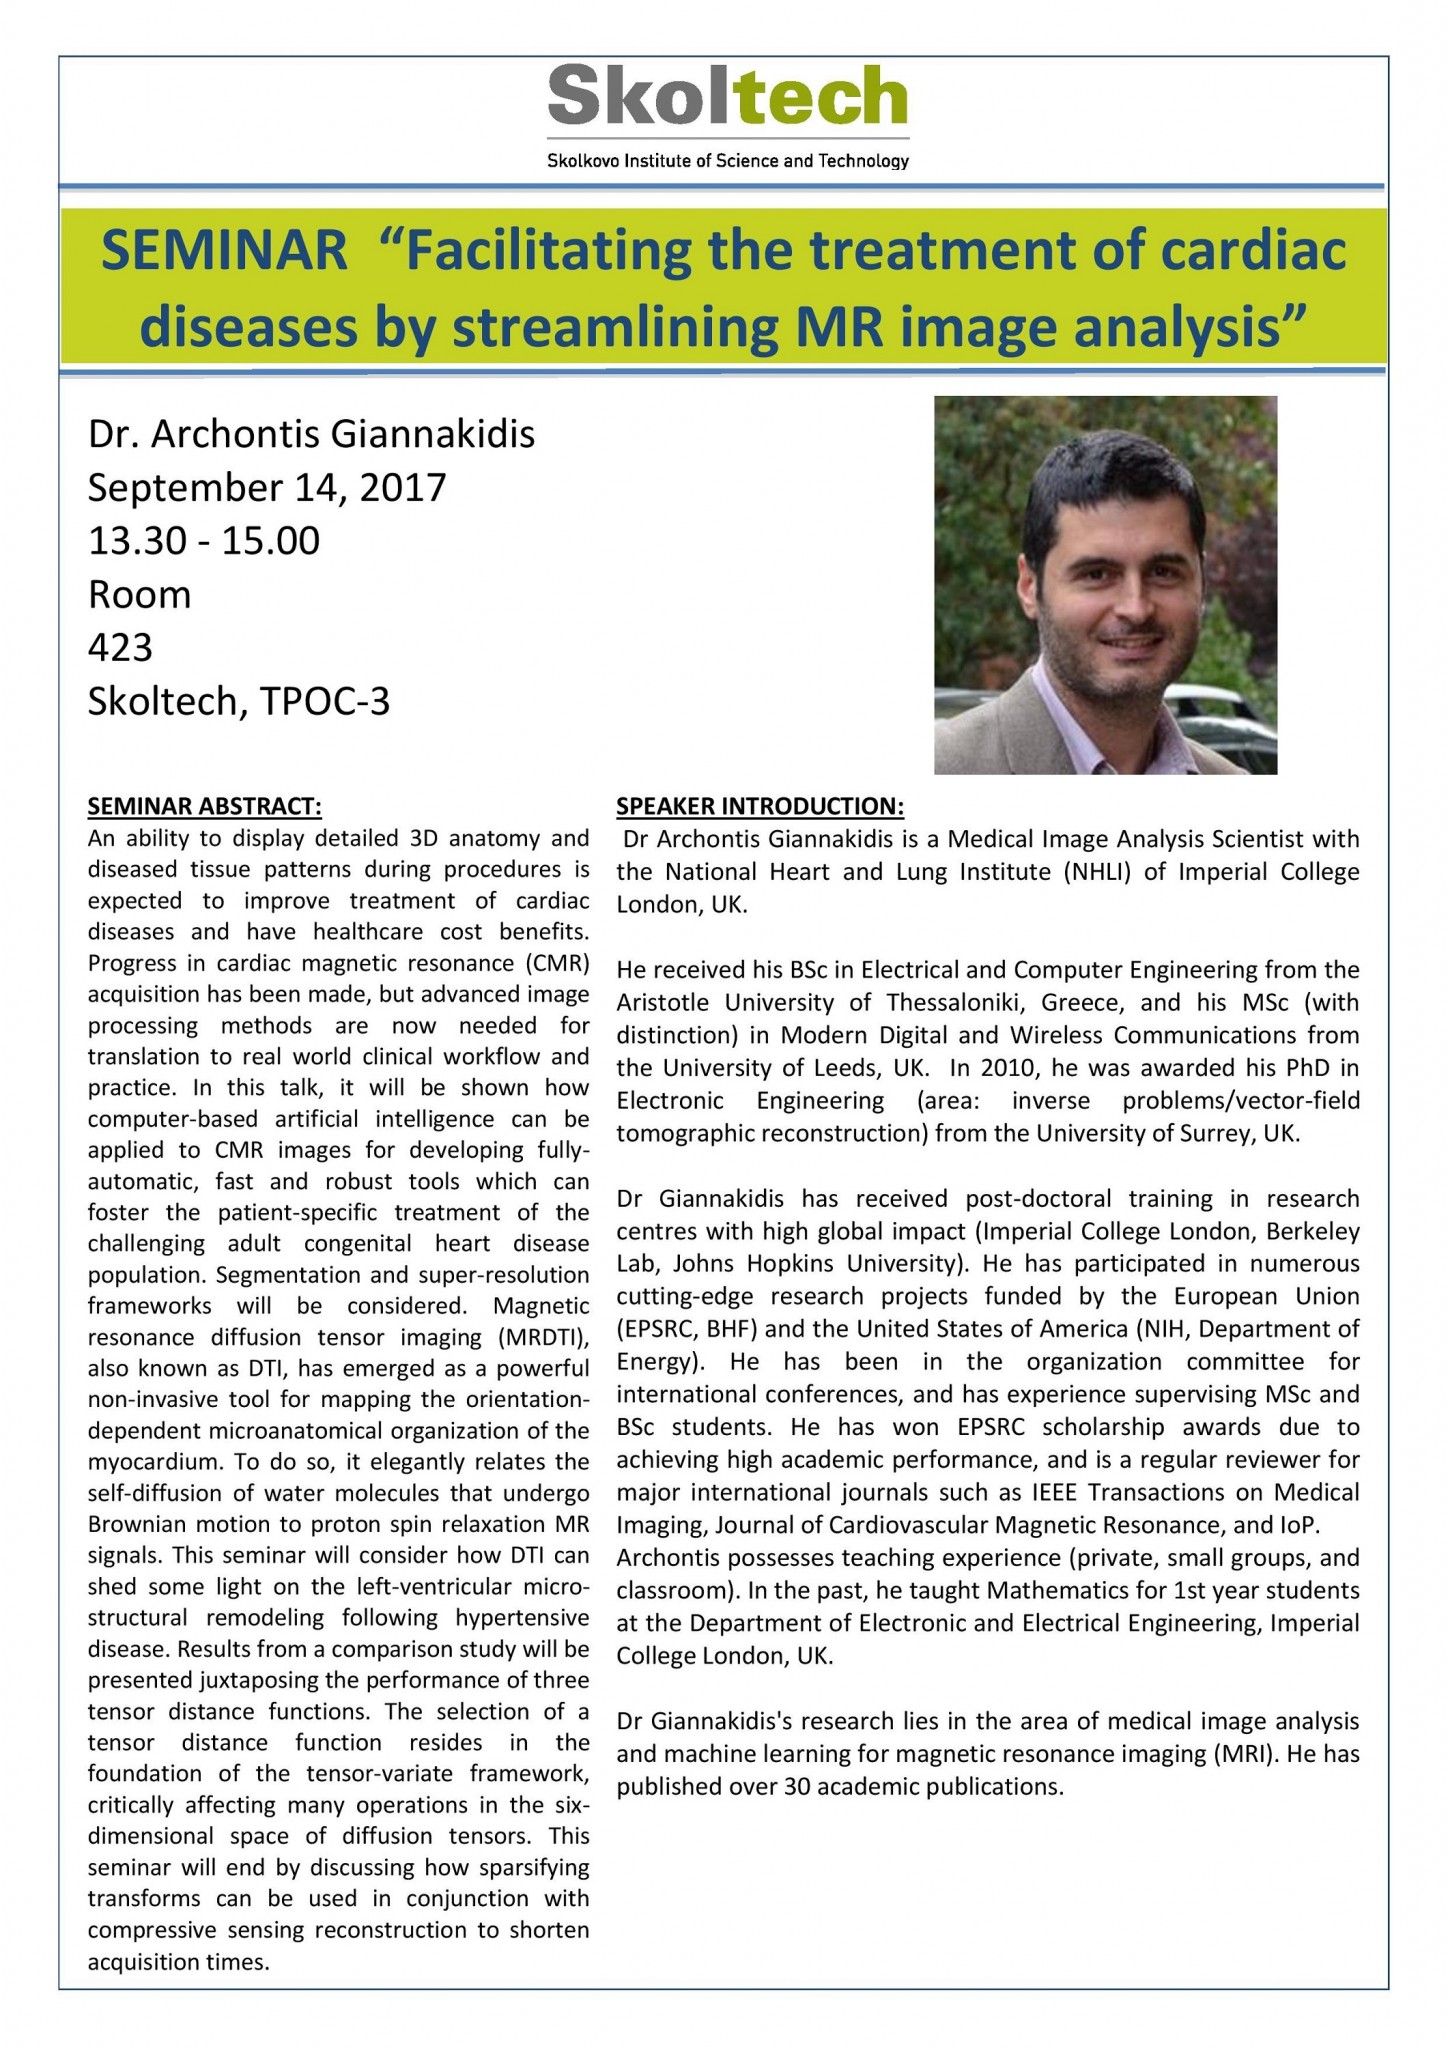 dr-archontis-giannakidis-seminar-announcement-page-0011